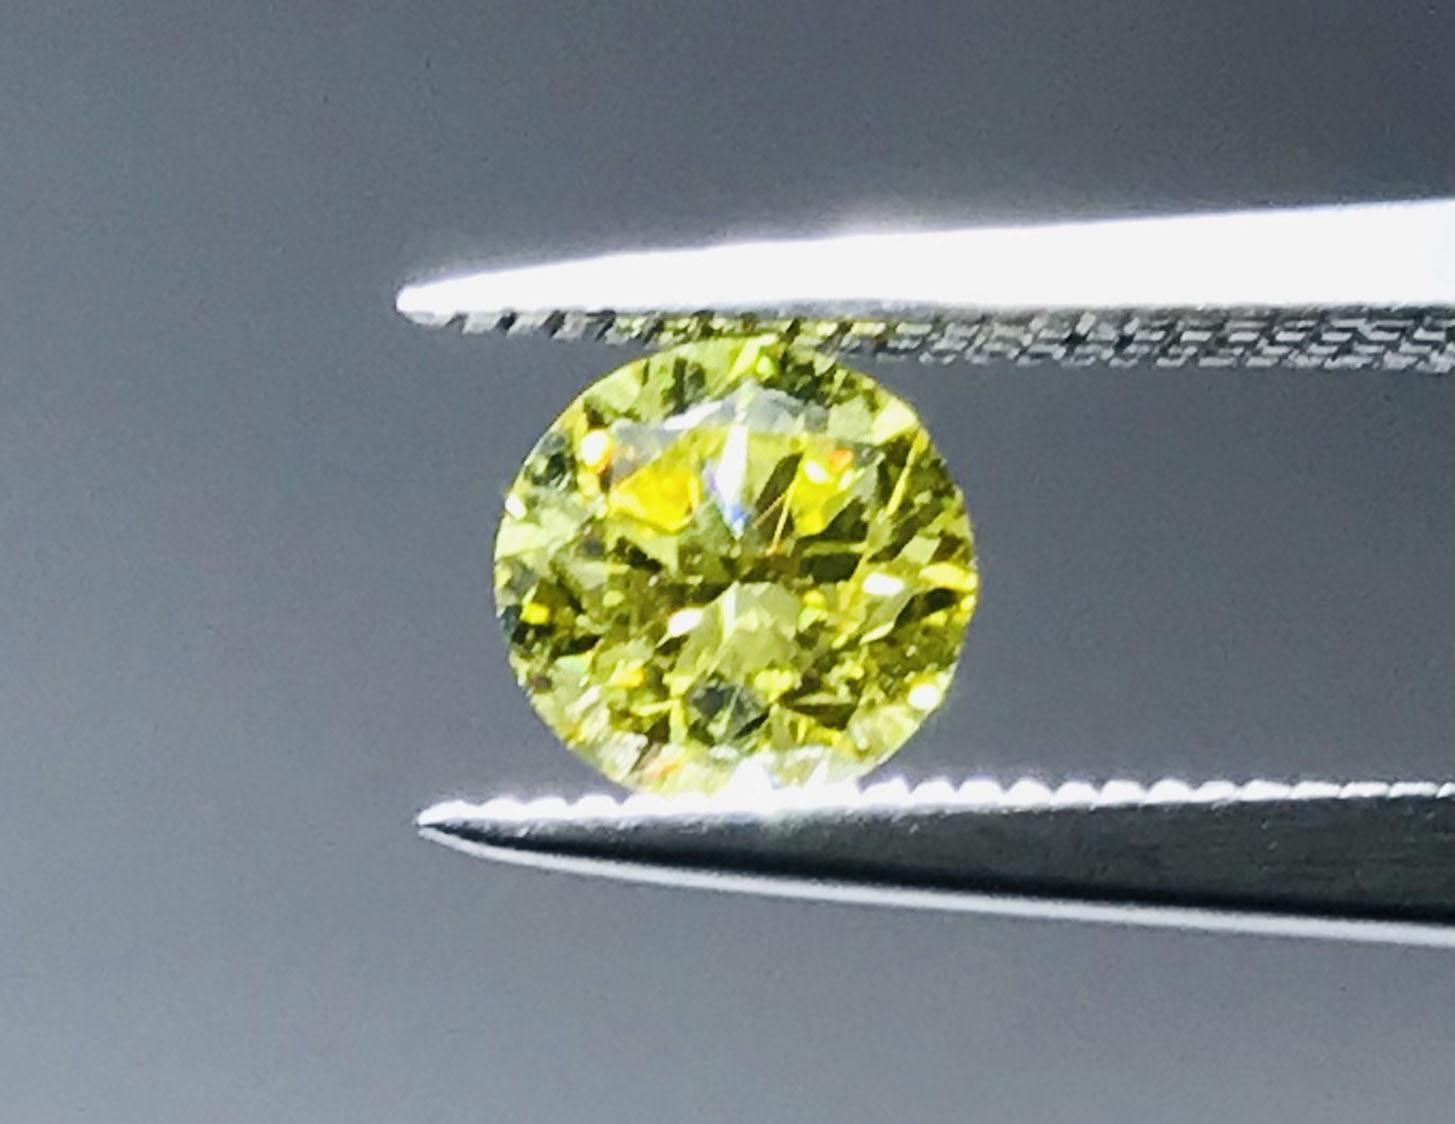 0.92 carat round brilliant cut canary yellow